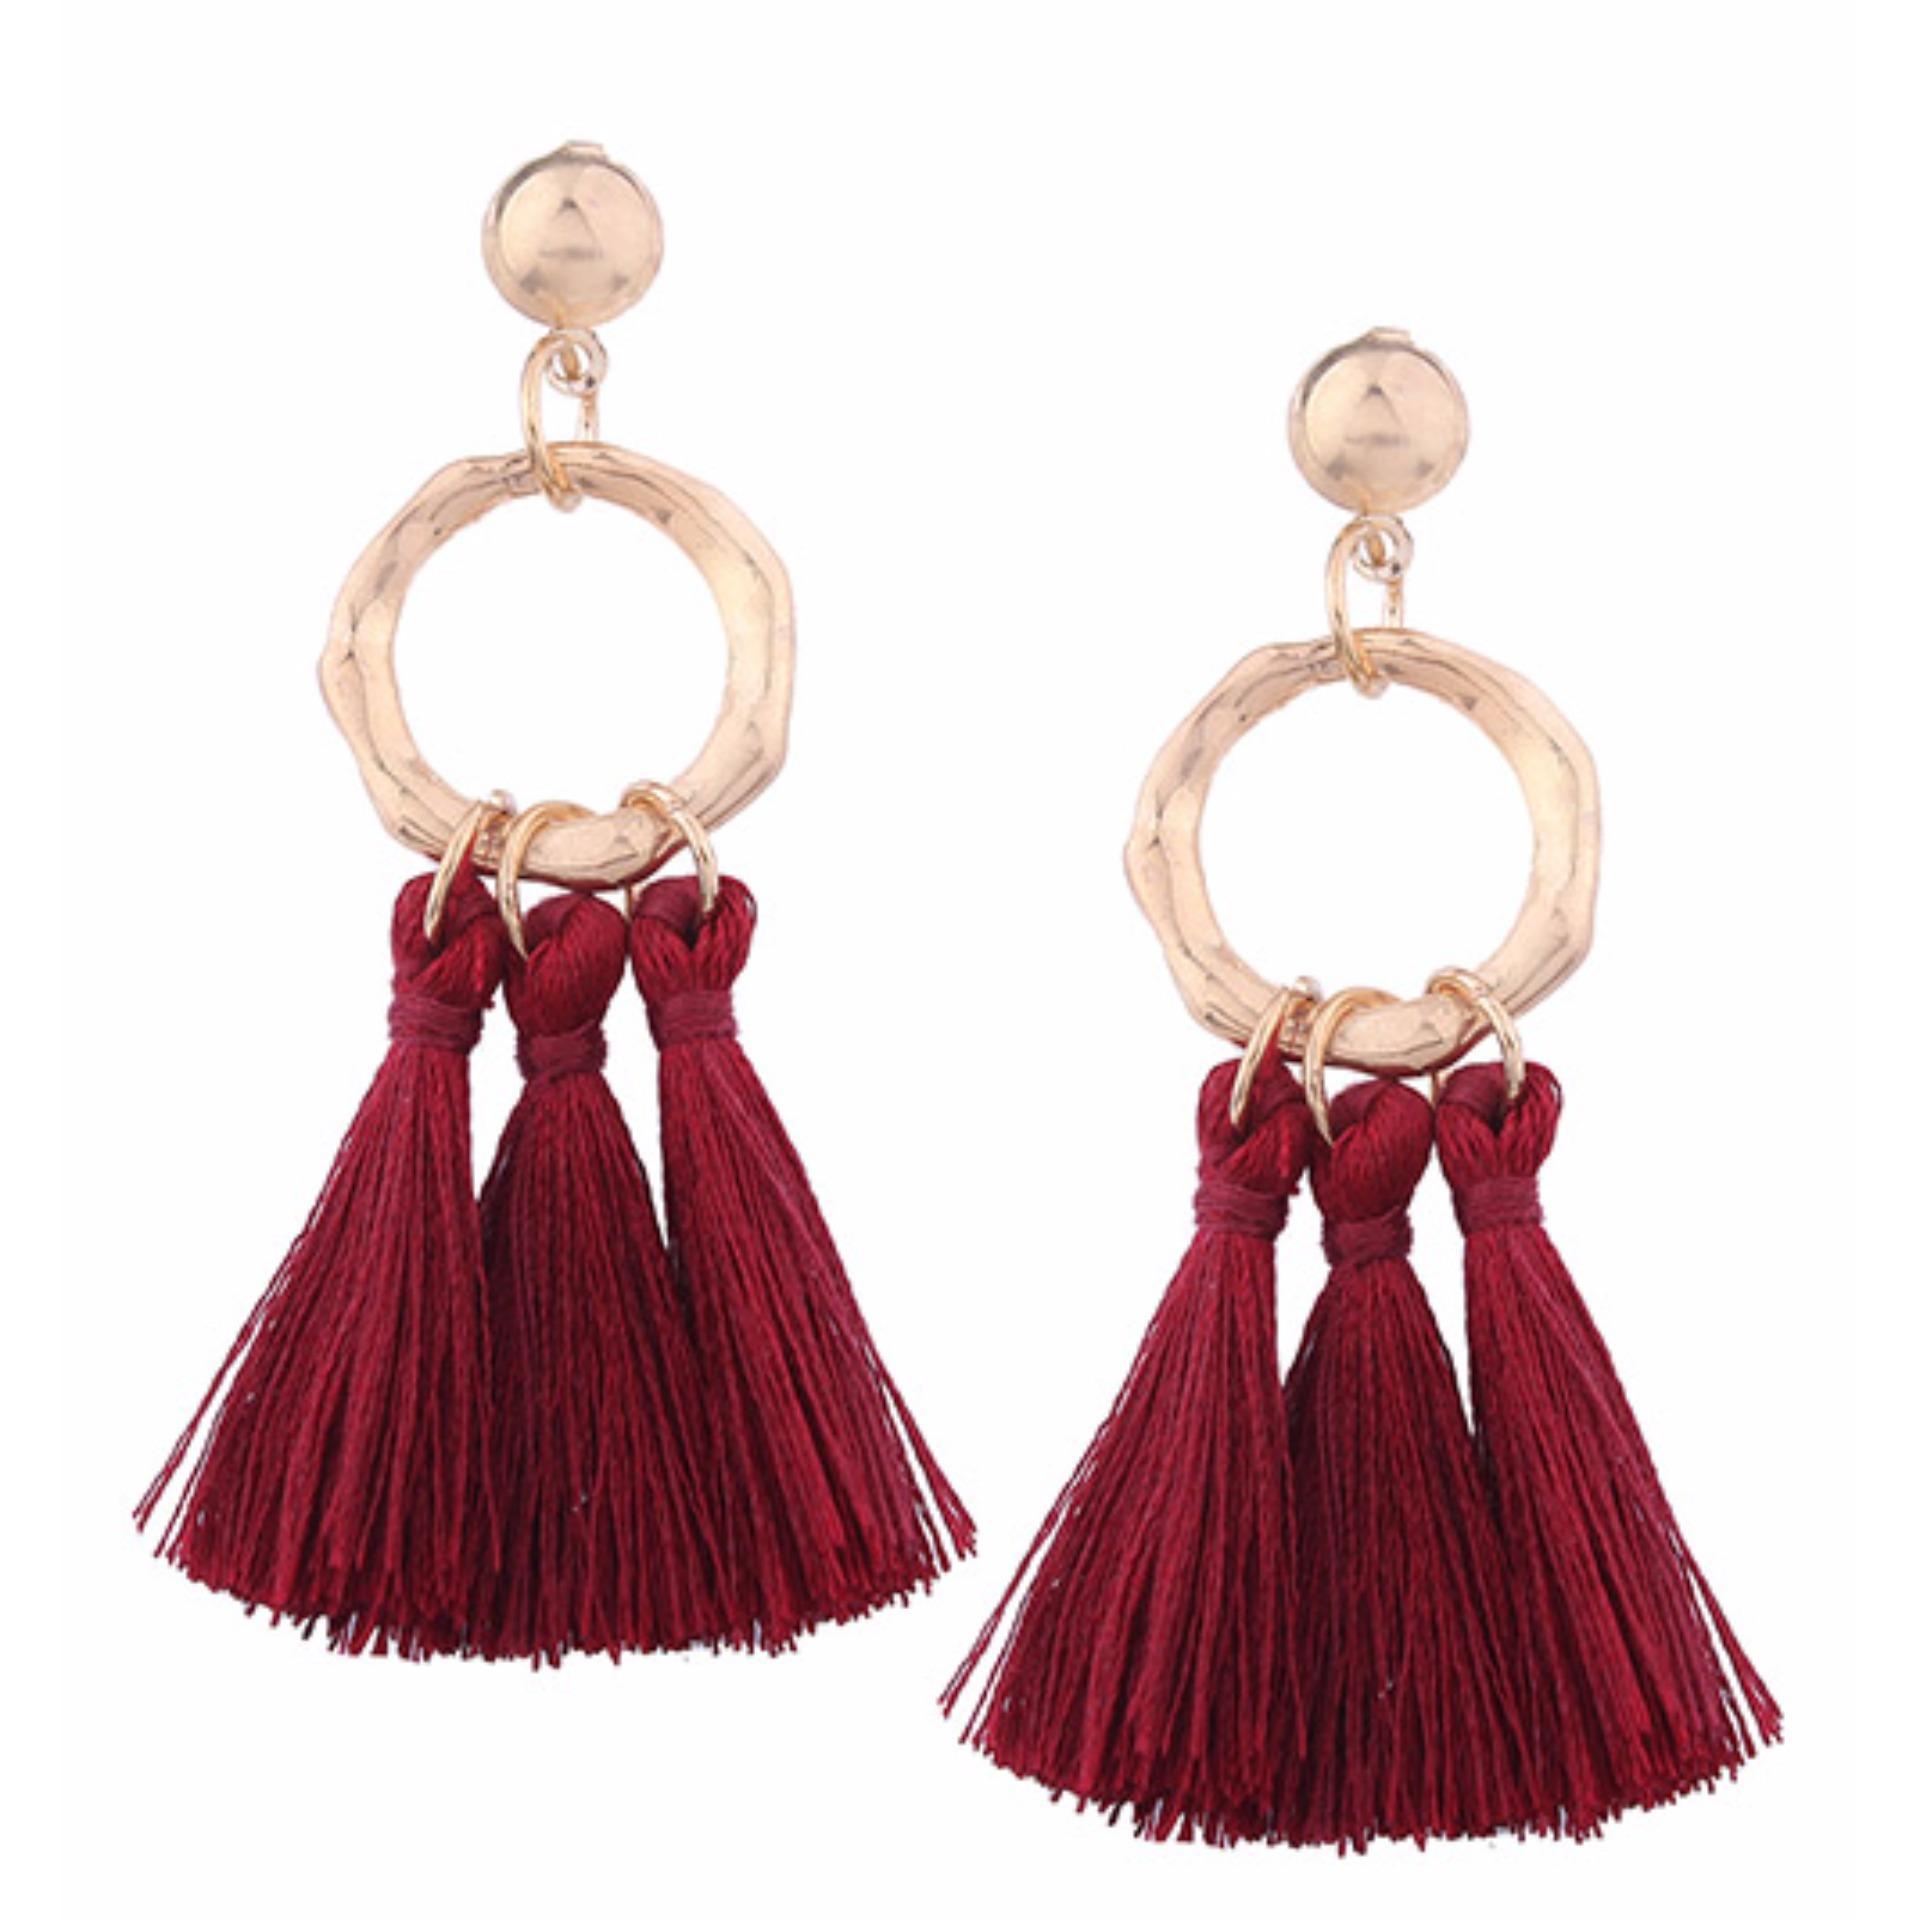 LRC Anting Tusuk Bohemia Tassel Decorated Earrings